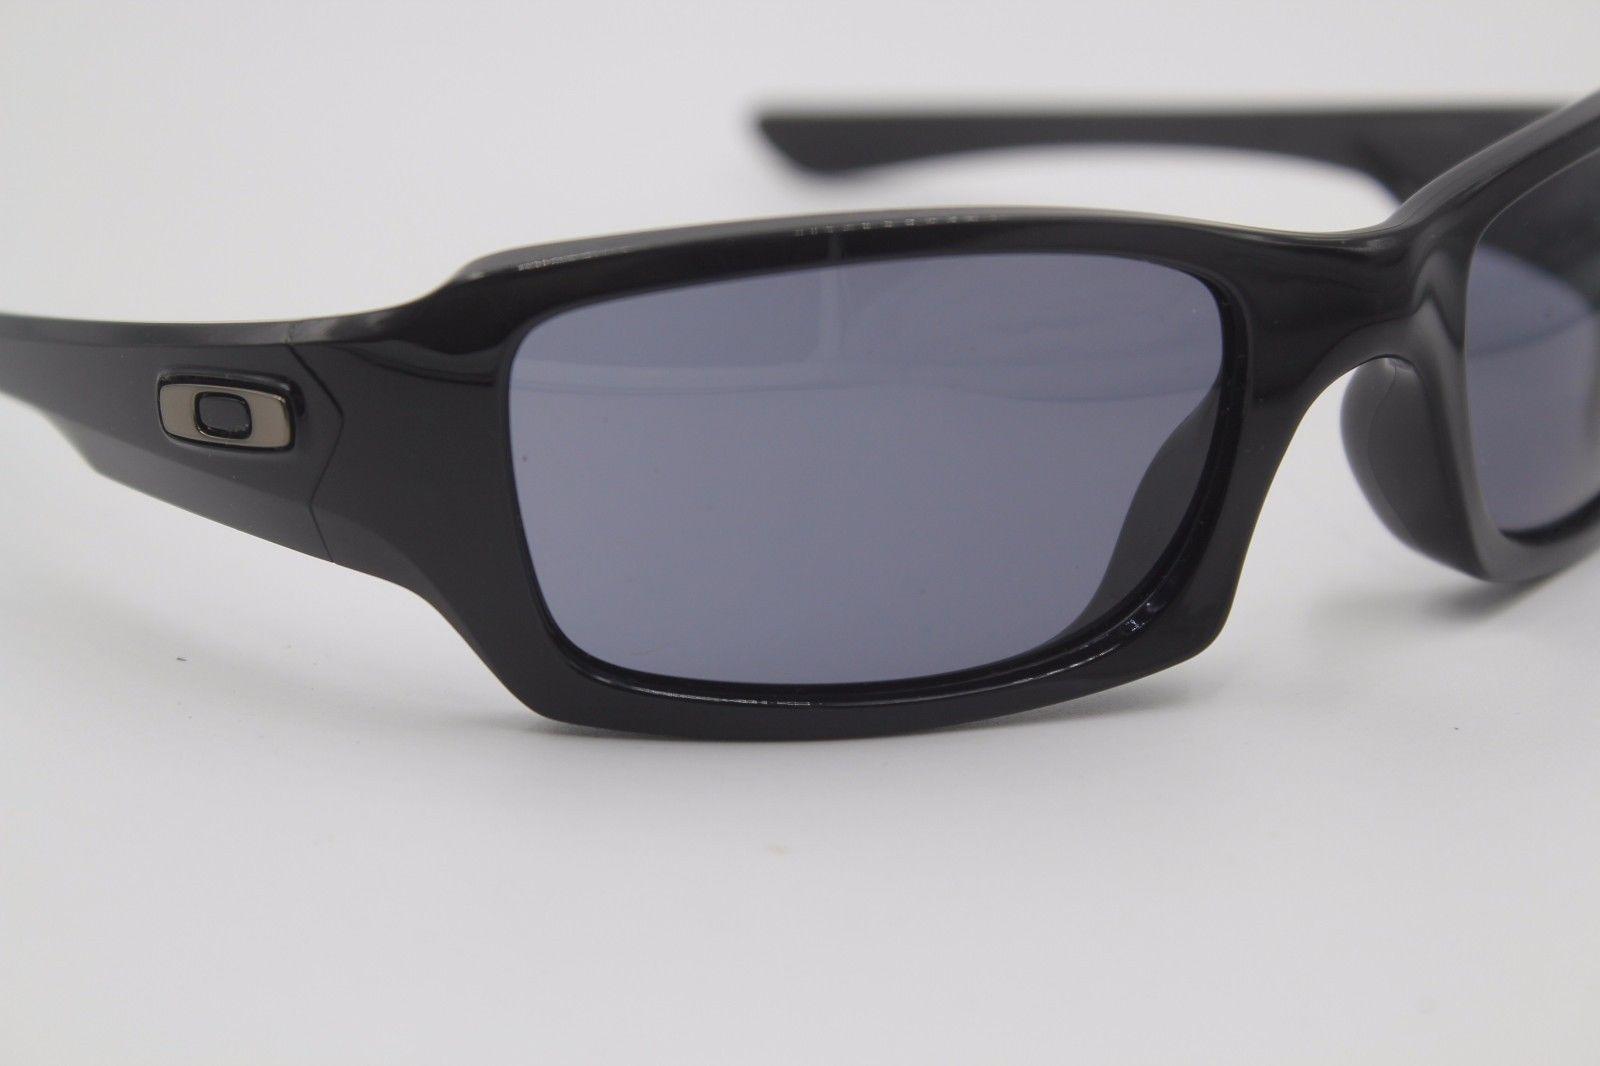 e1bc09530dd Oakley Livestrong Scalpel Replacement Lenses « Heritage Malta